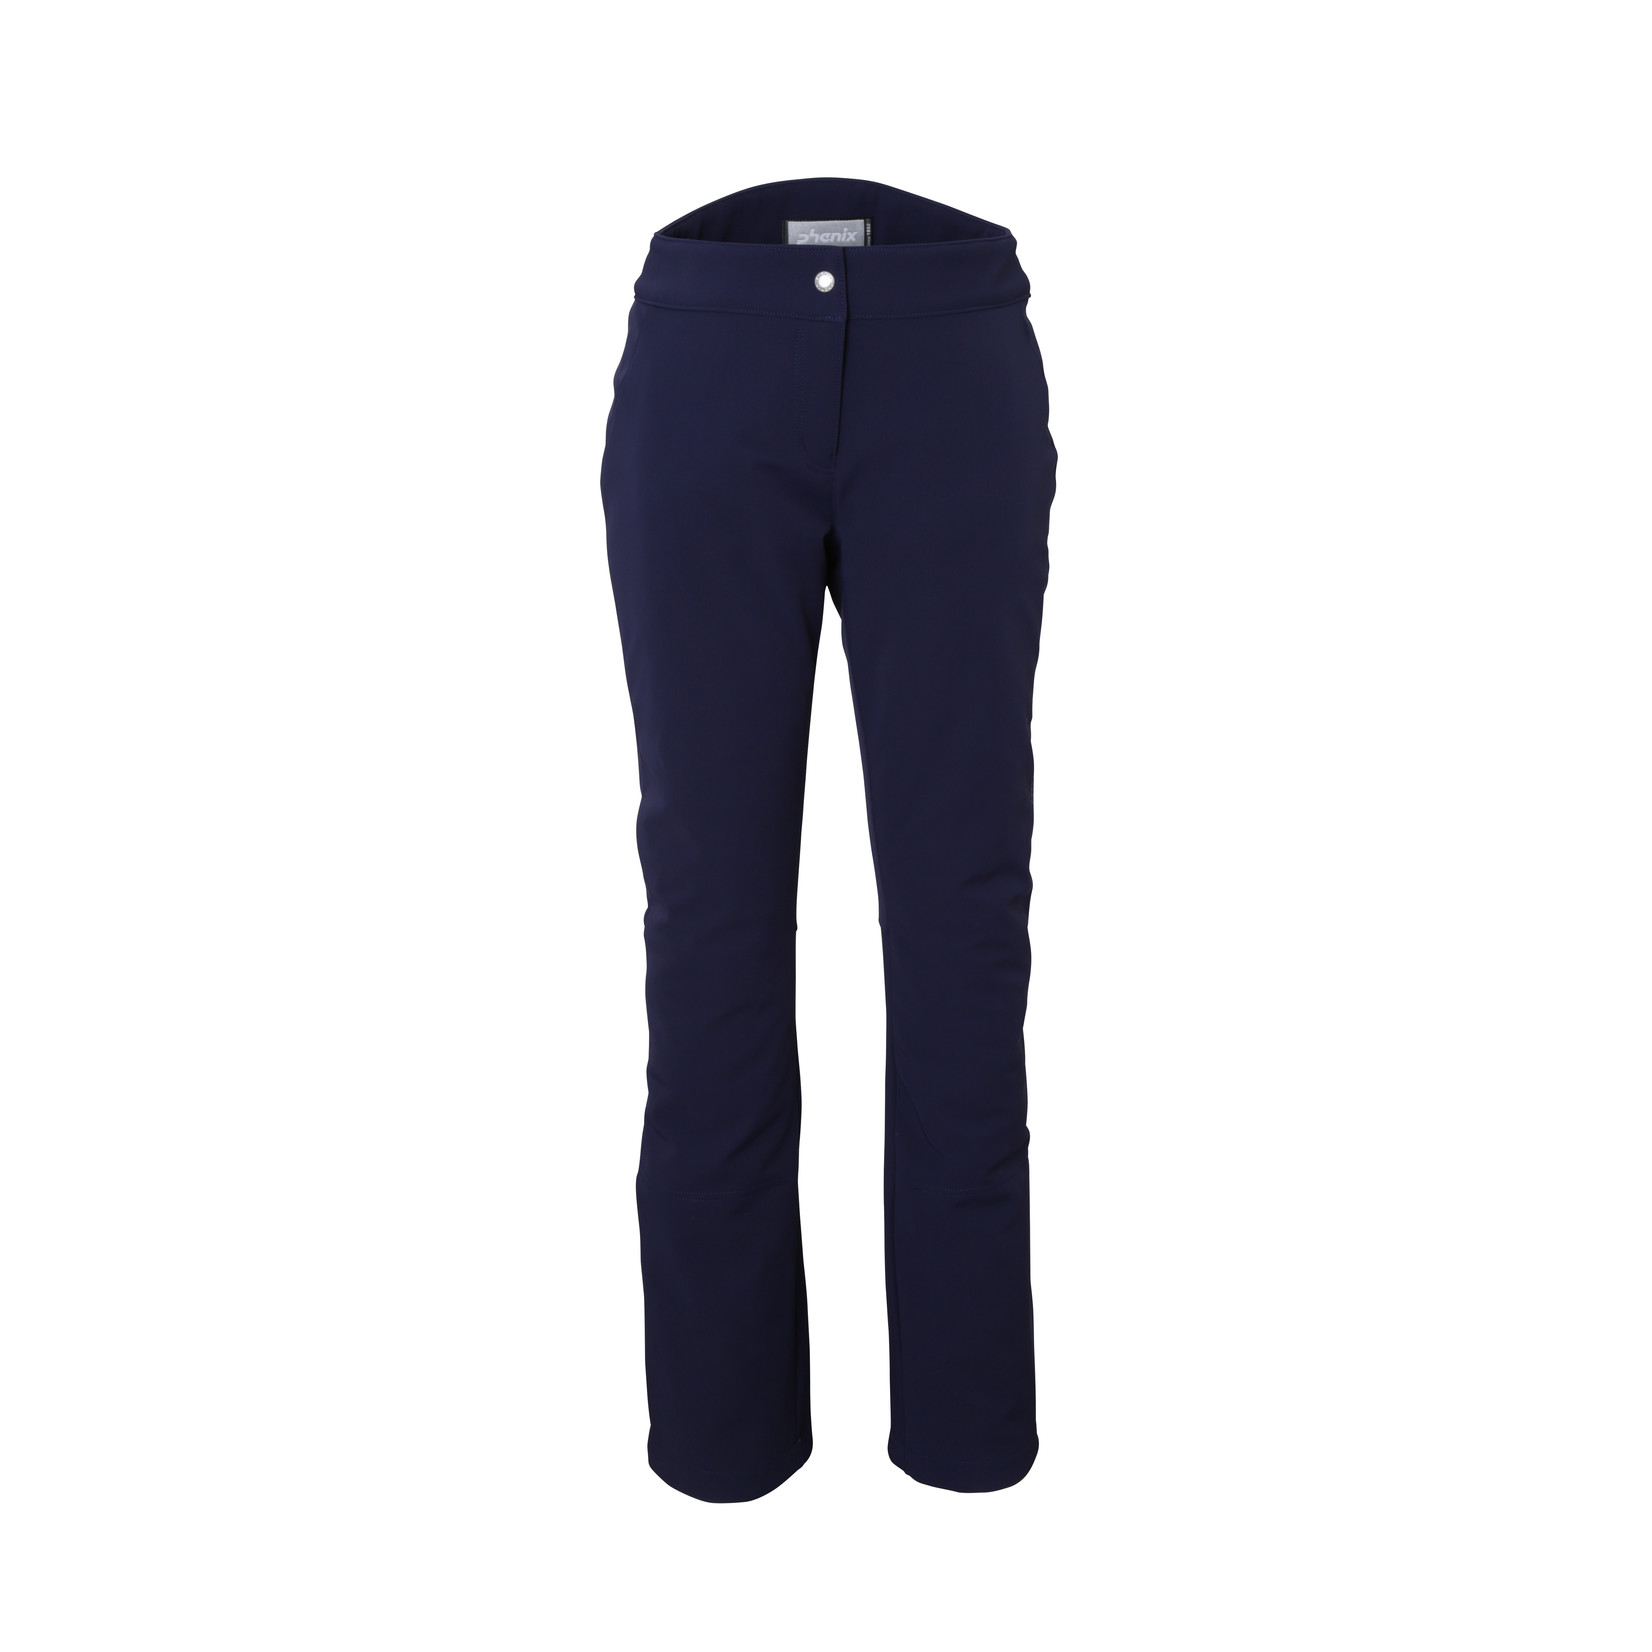 PHENIX Willow Jet Pants